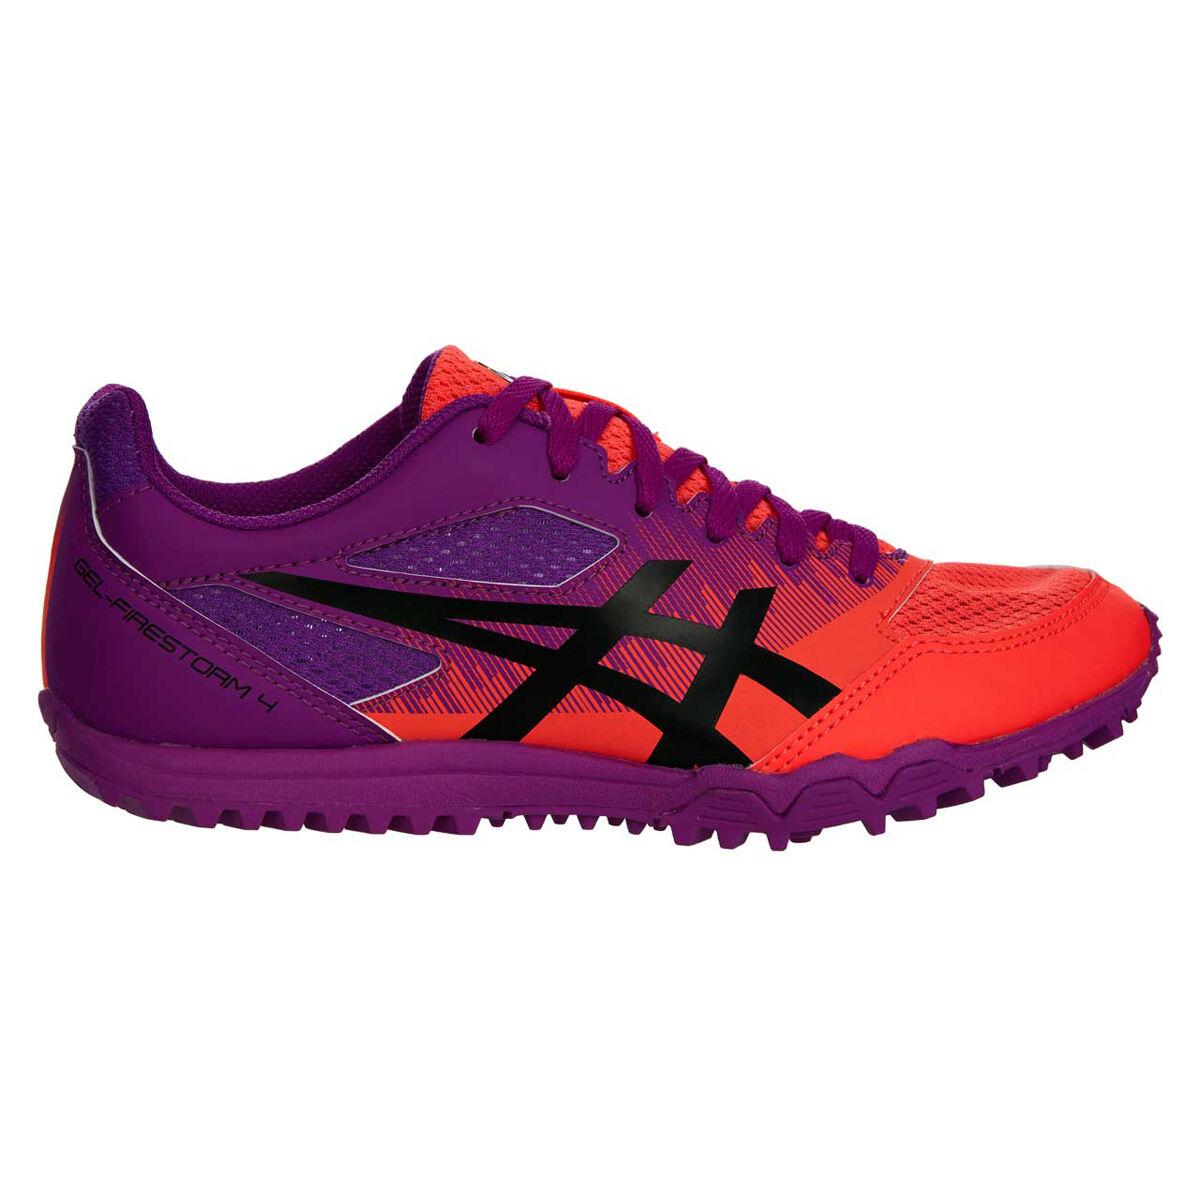 Asics GEL Firestorm 4 Kids Track Shoes